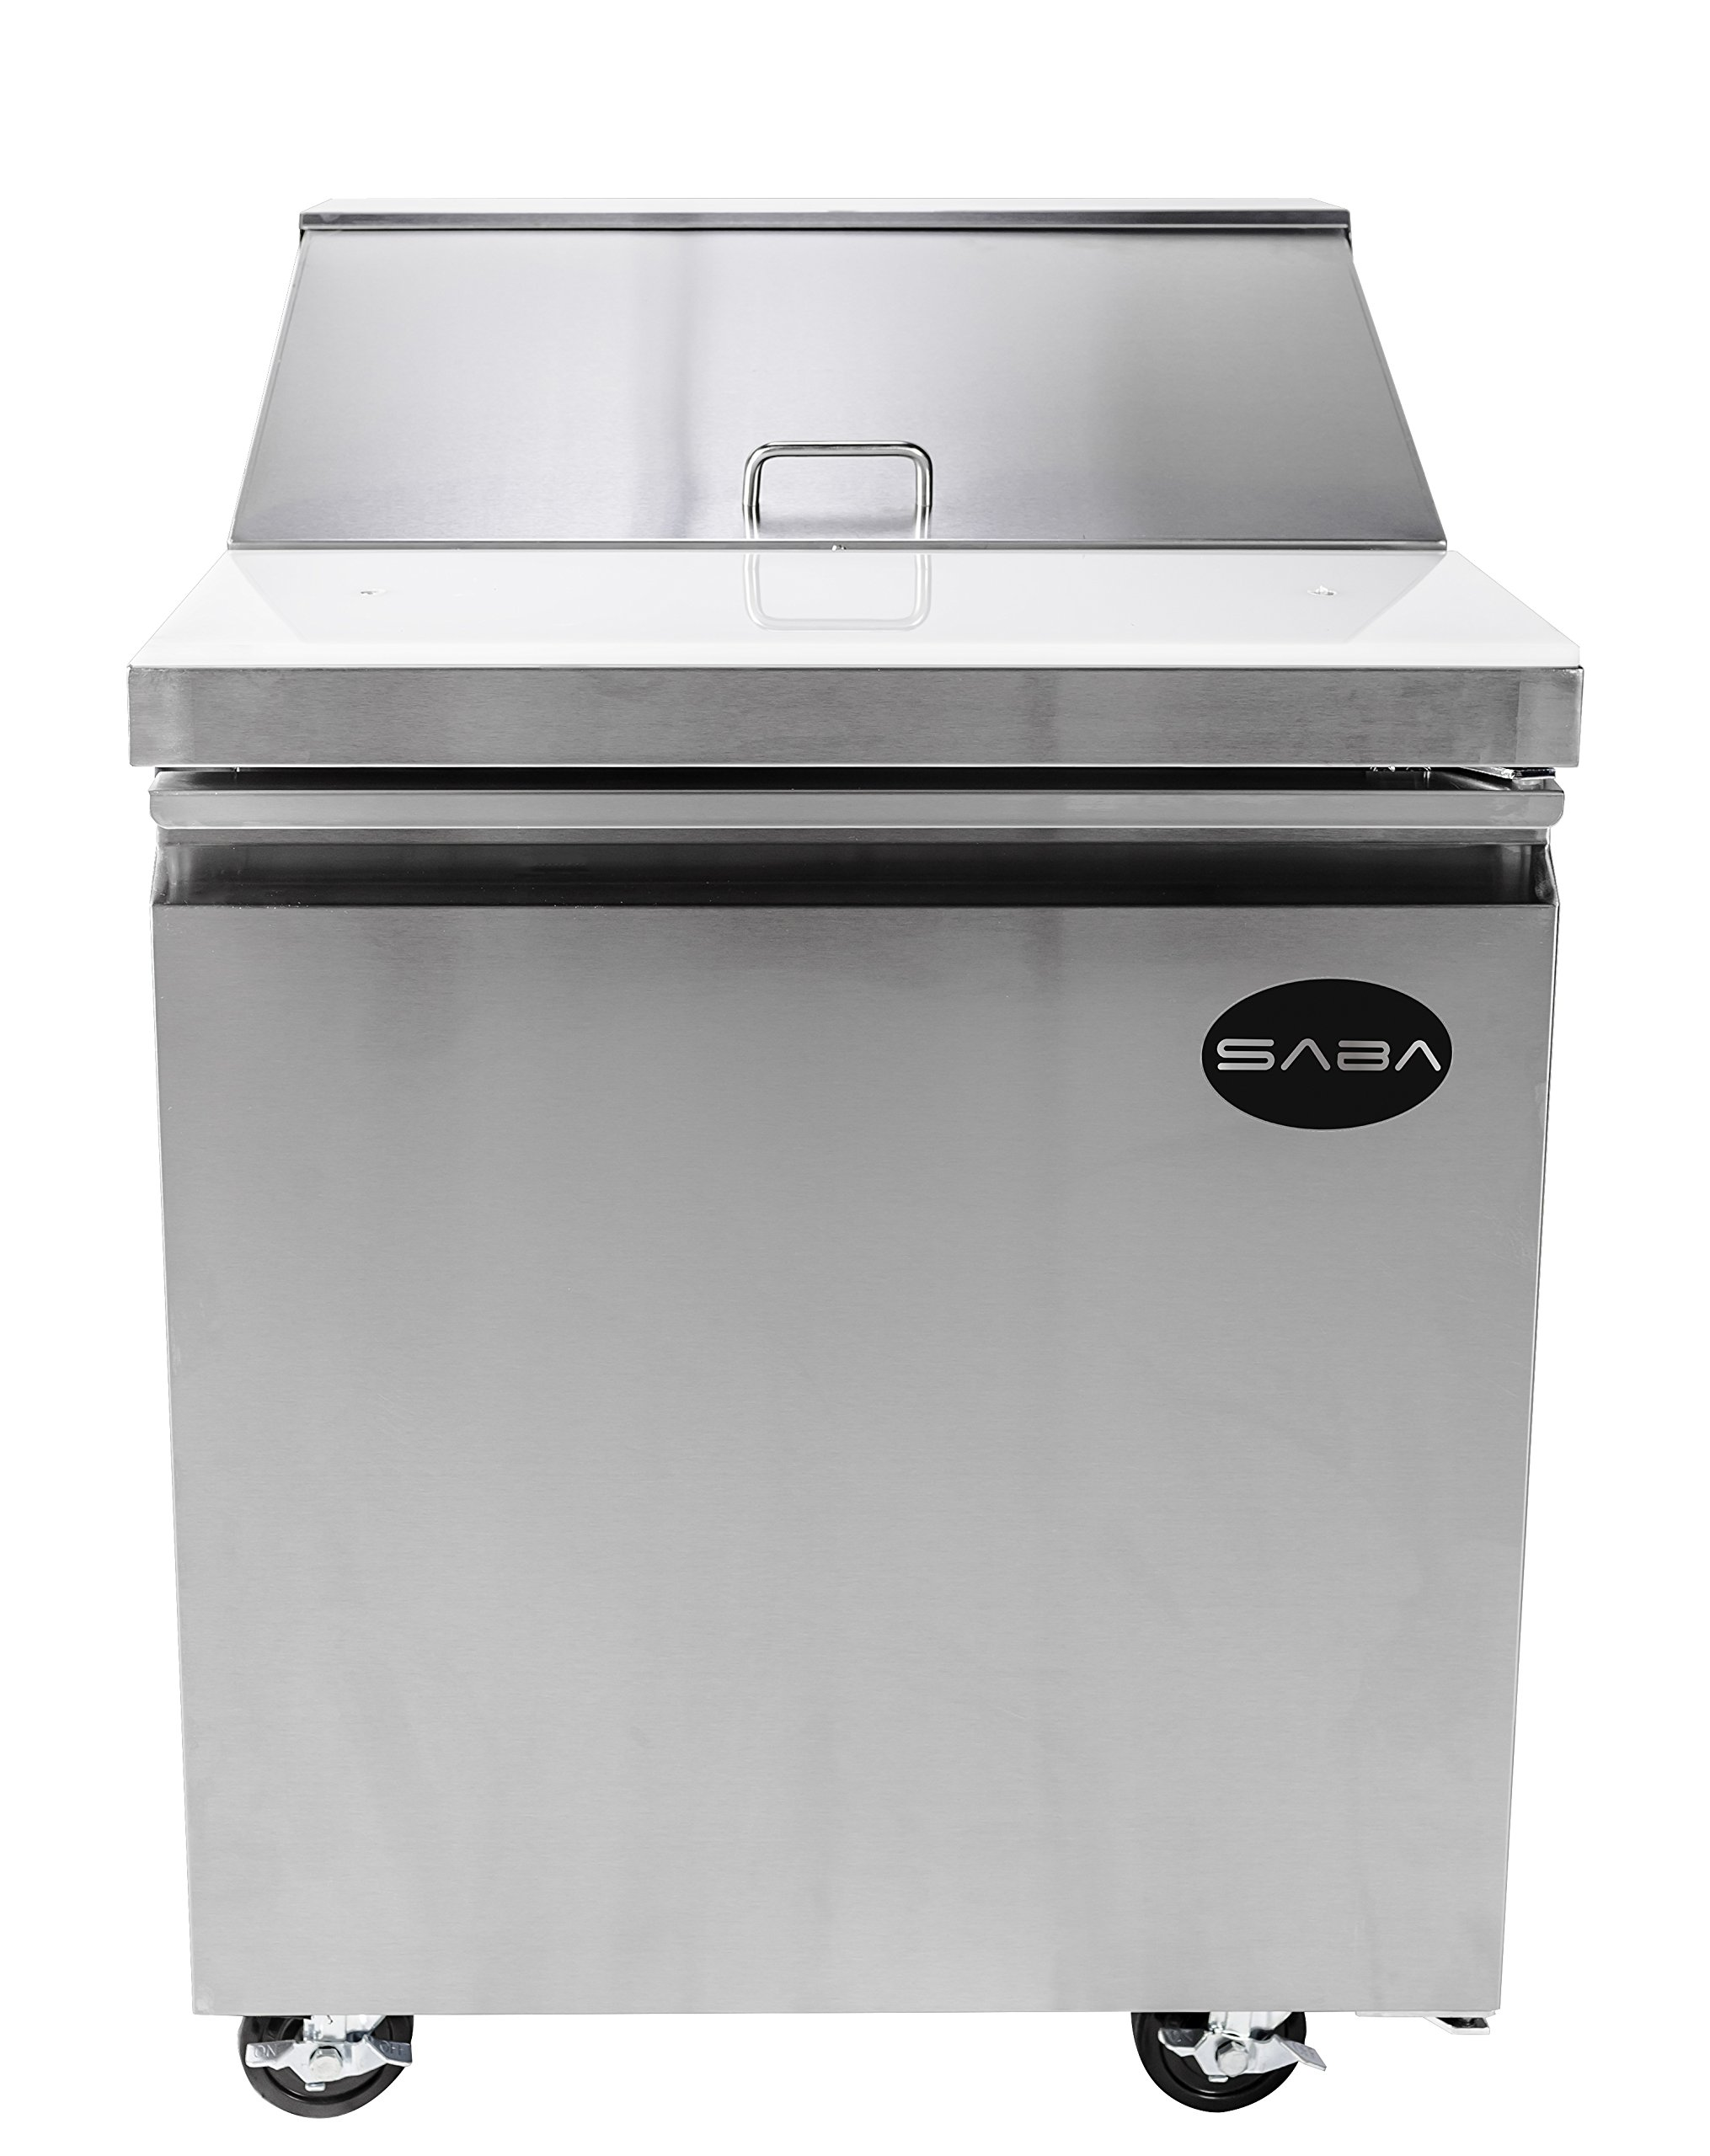 "Heavy Duty Commercial Sandwich Salad Prep Table Refrigerator Cooler 1 Door 27"""